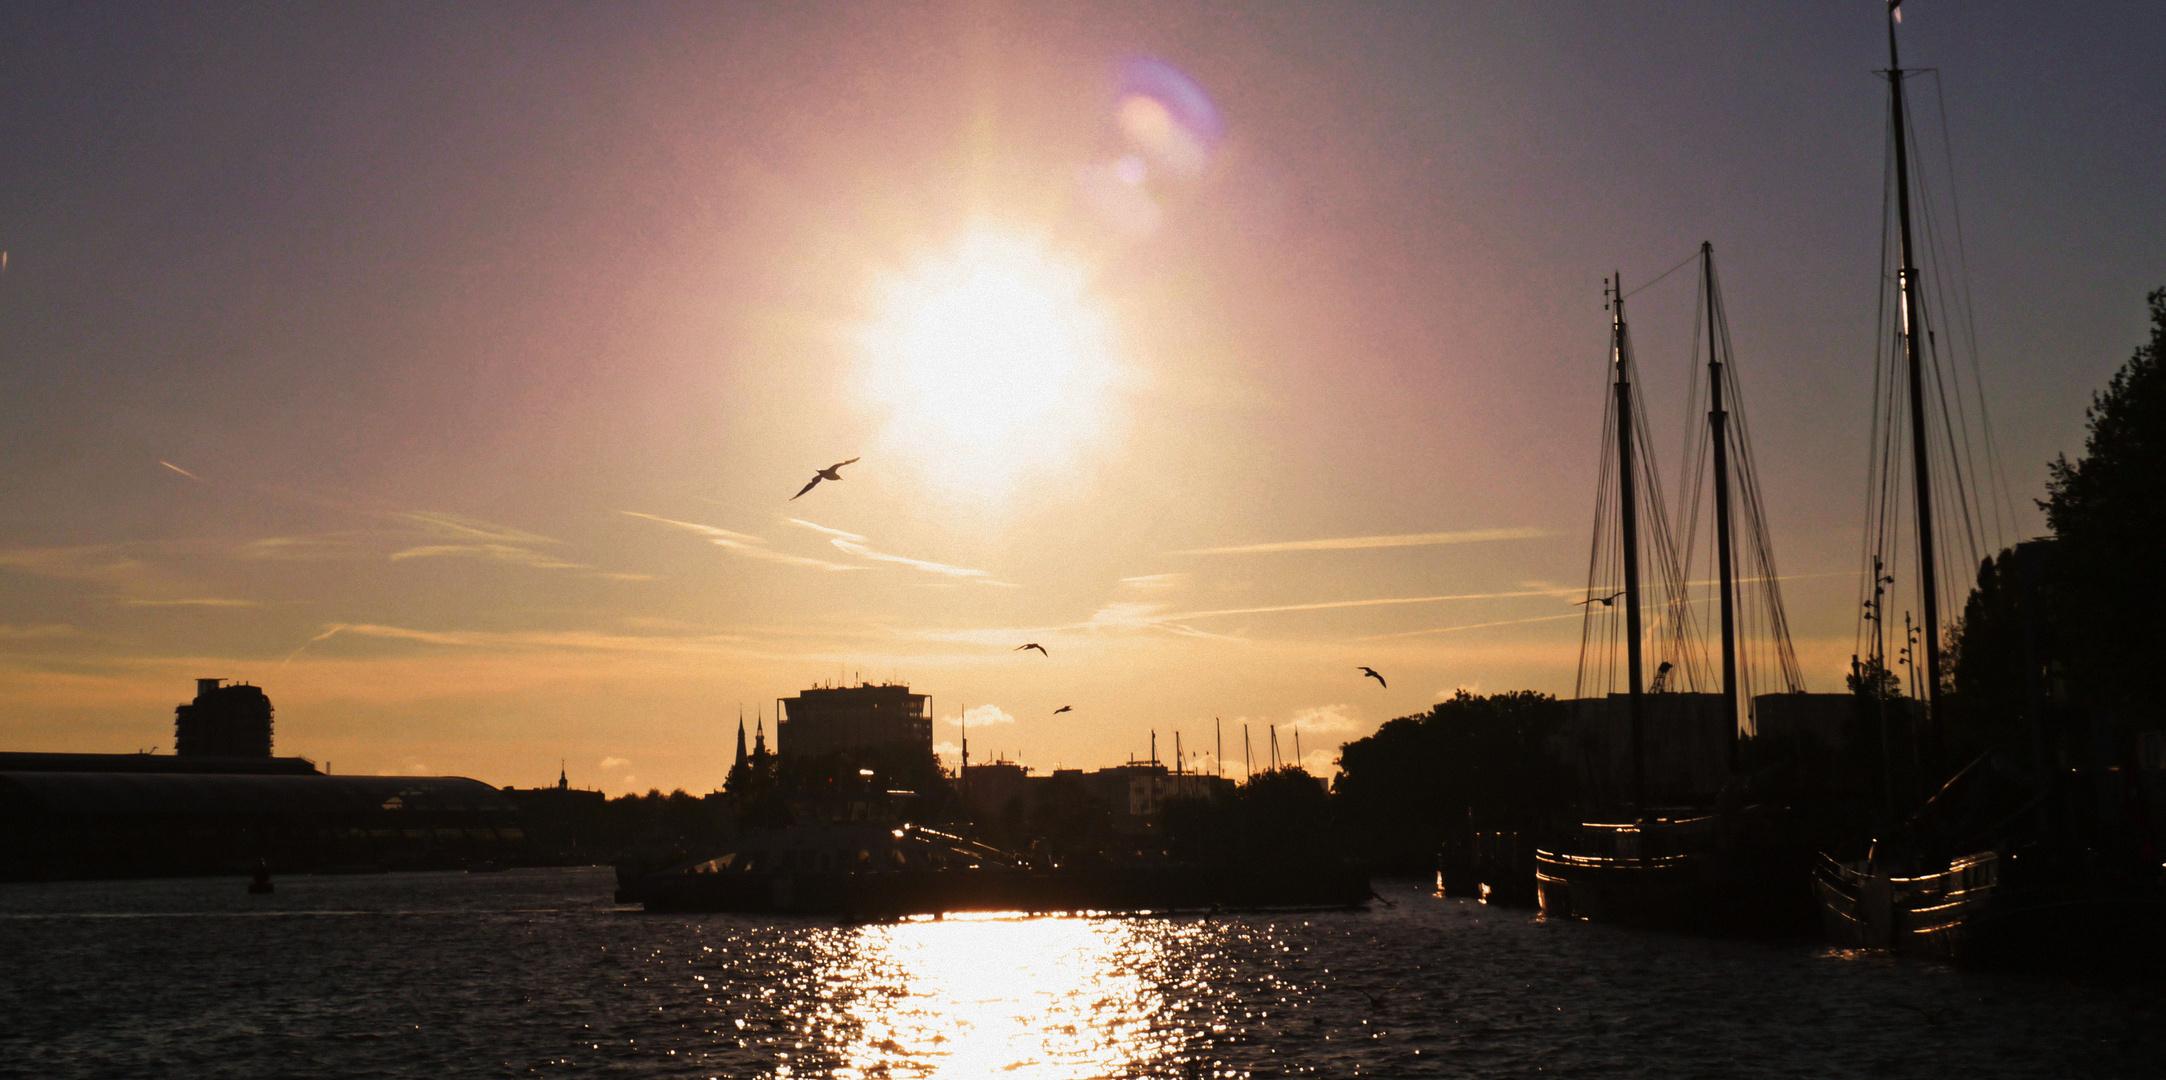 Fähre im Sonnenuntergang, Amsterdam